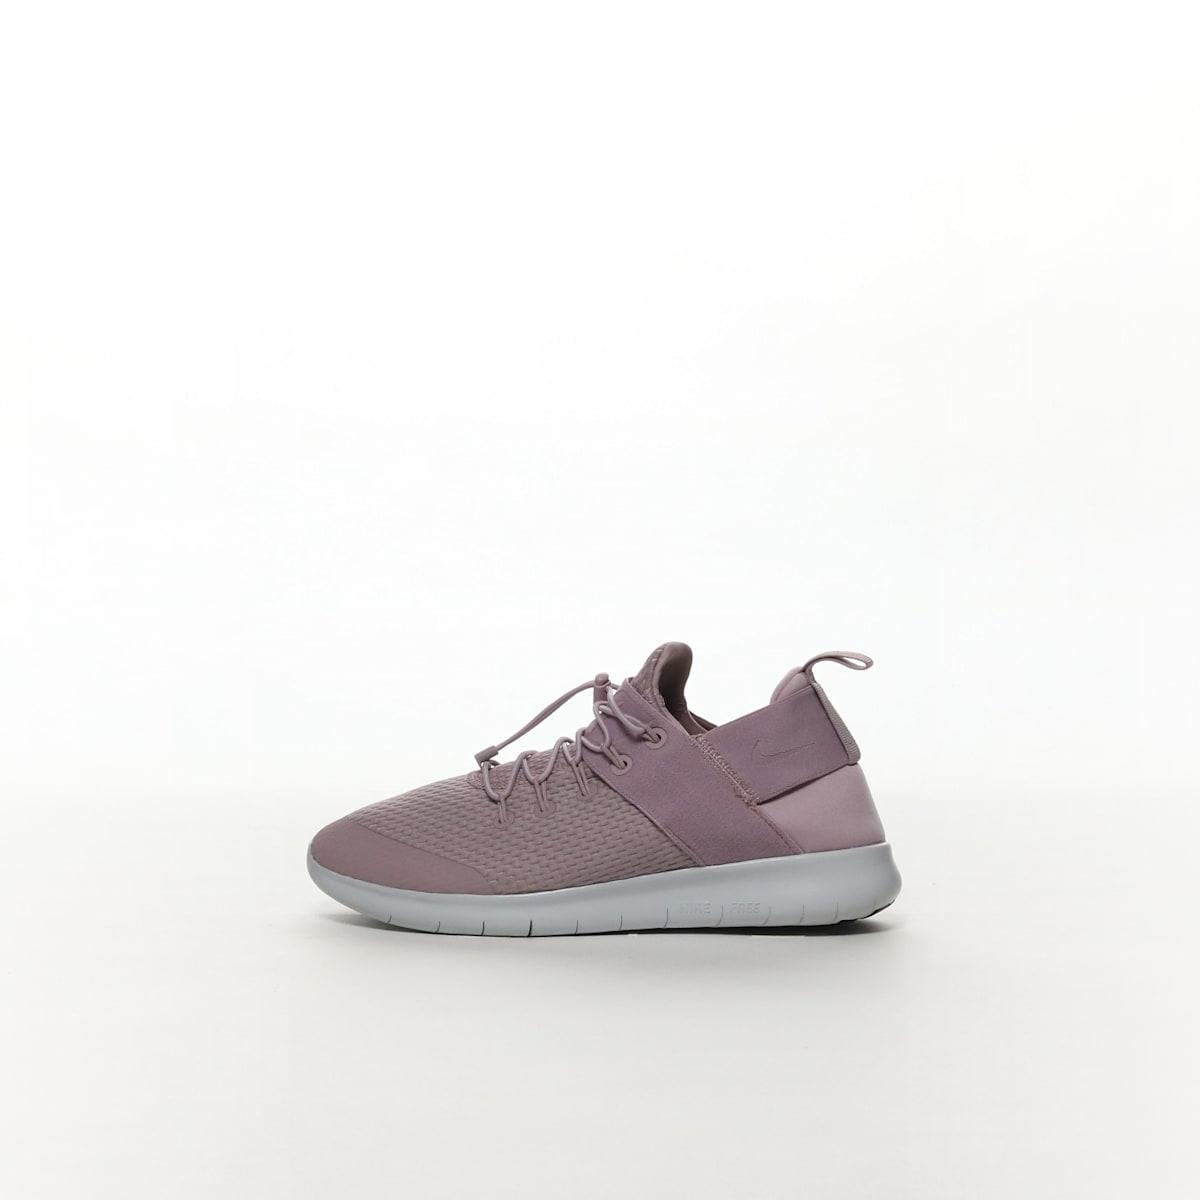 5f7207462147 Women s Nike Free RN Commuter 2017 Running Shoe - PLUFOG SNSTGL – Resku